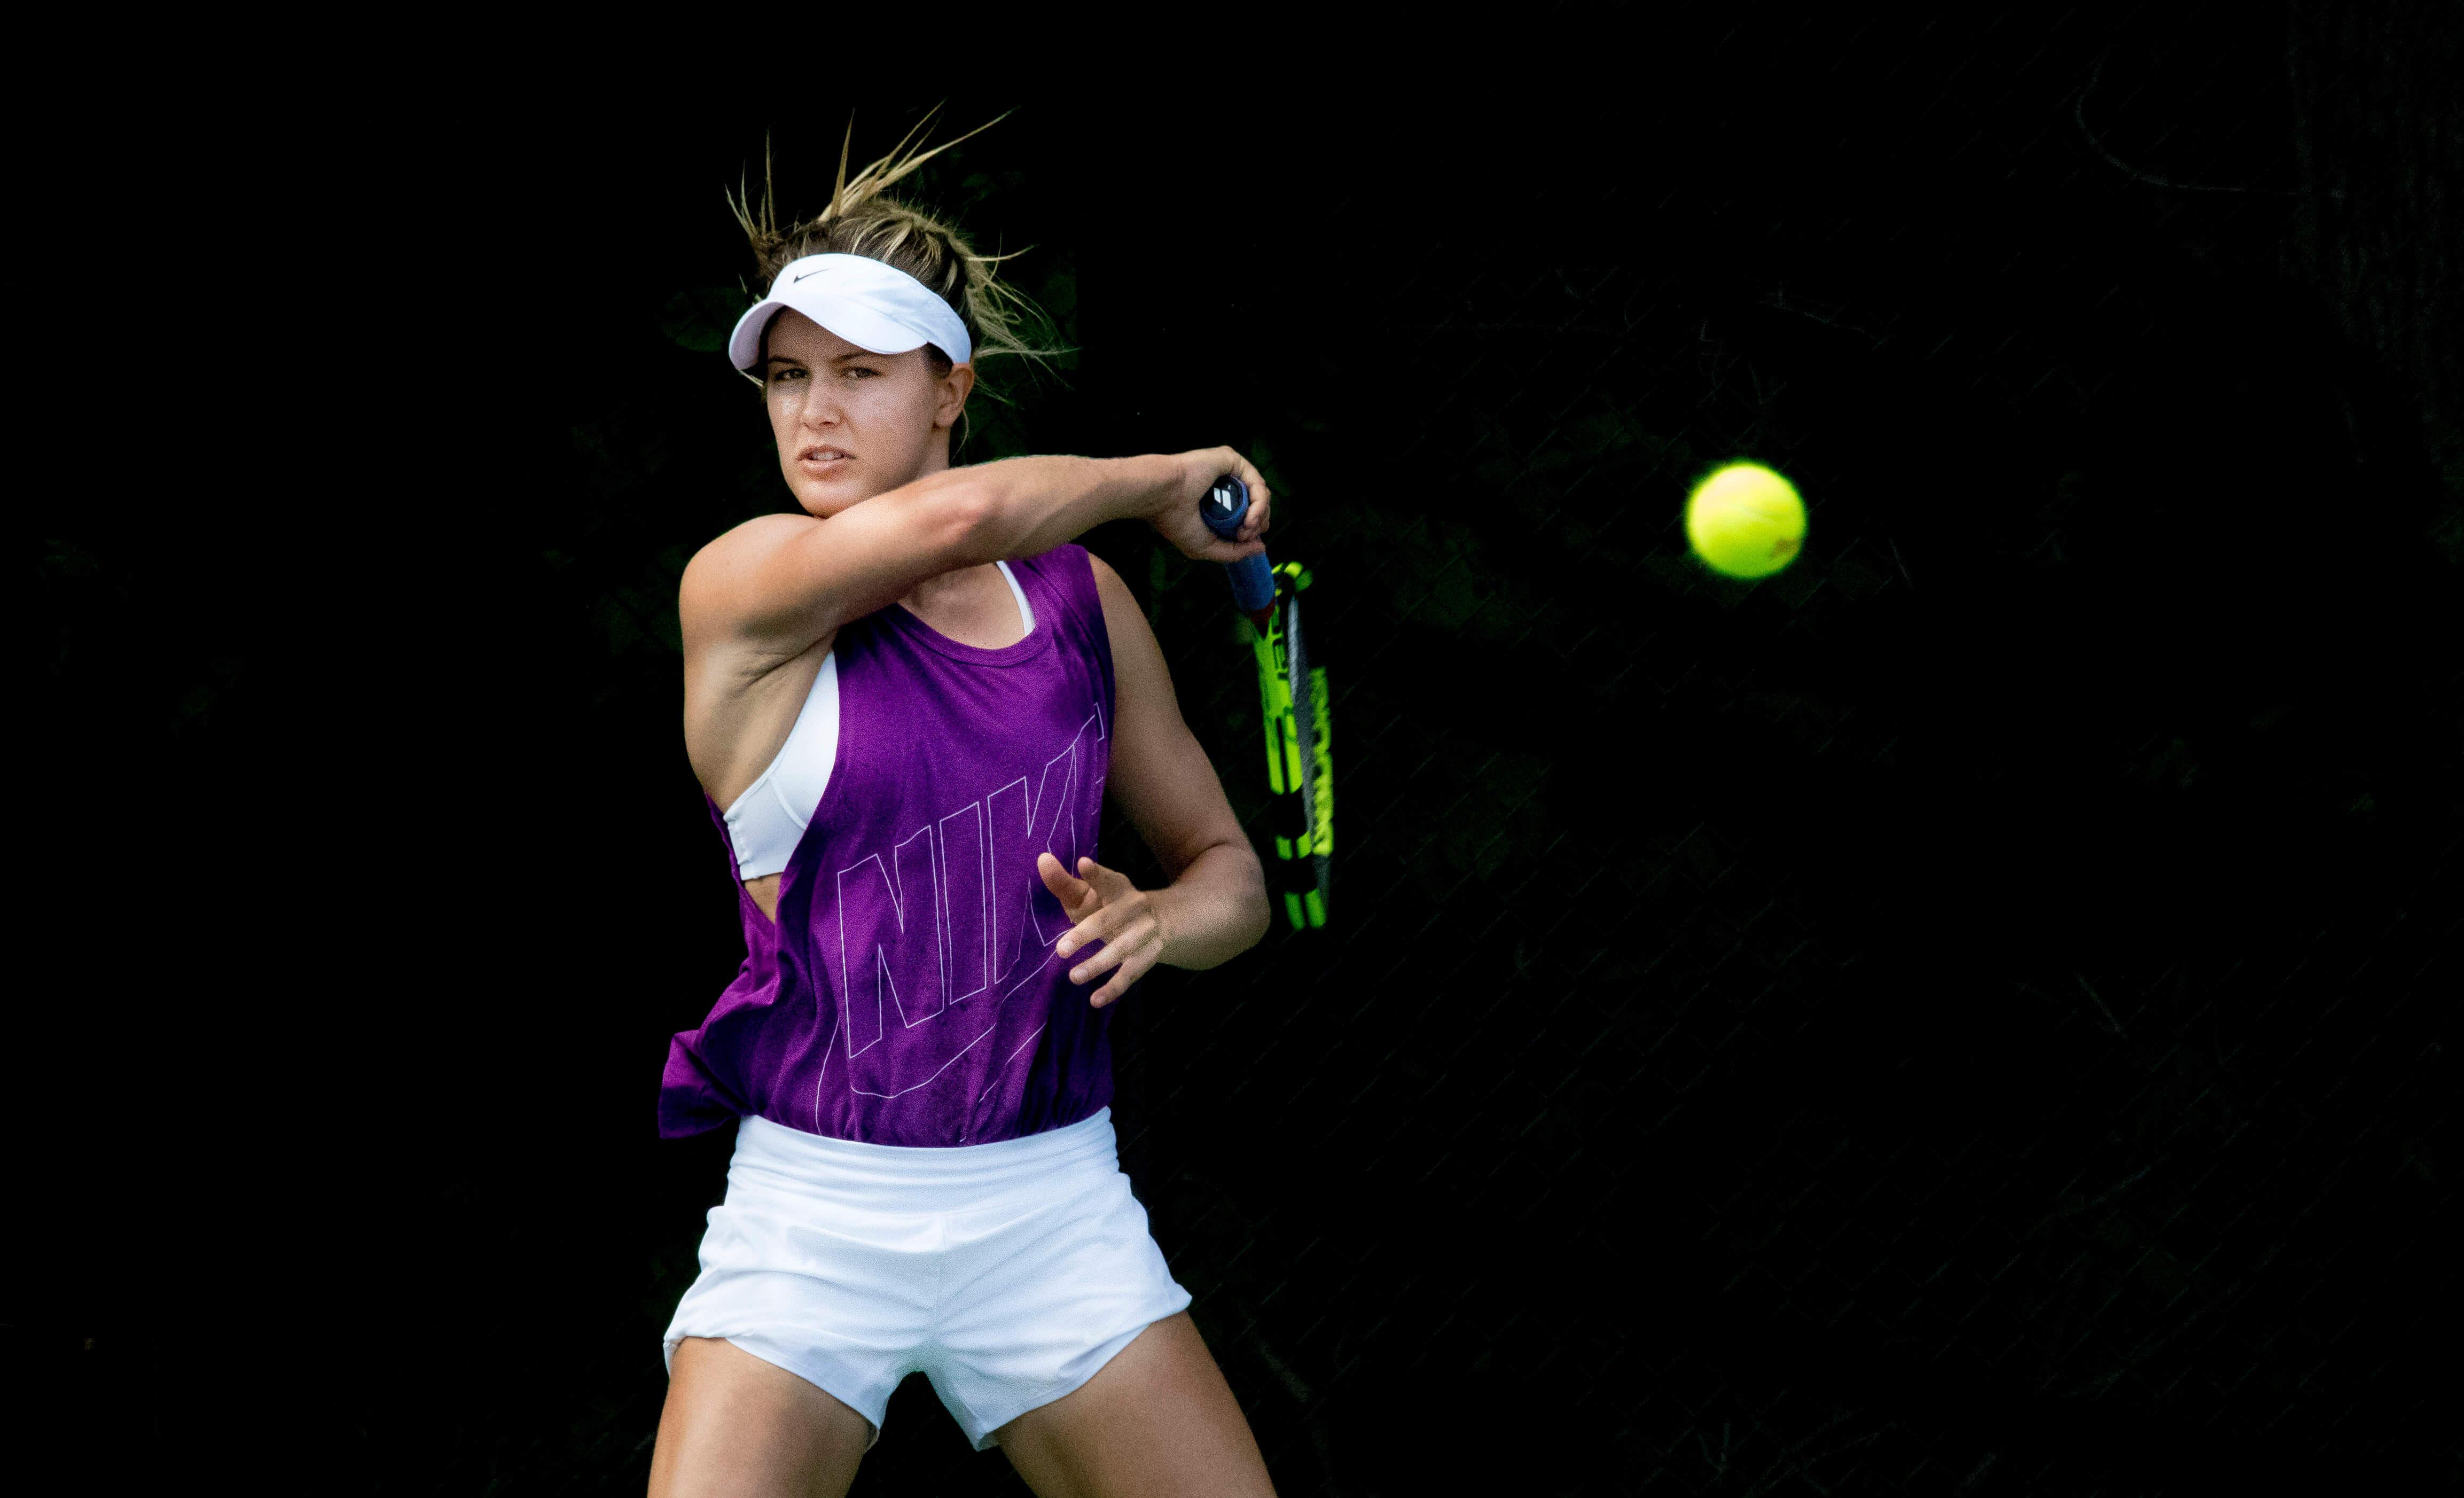 Female tennis players grunt